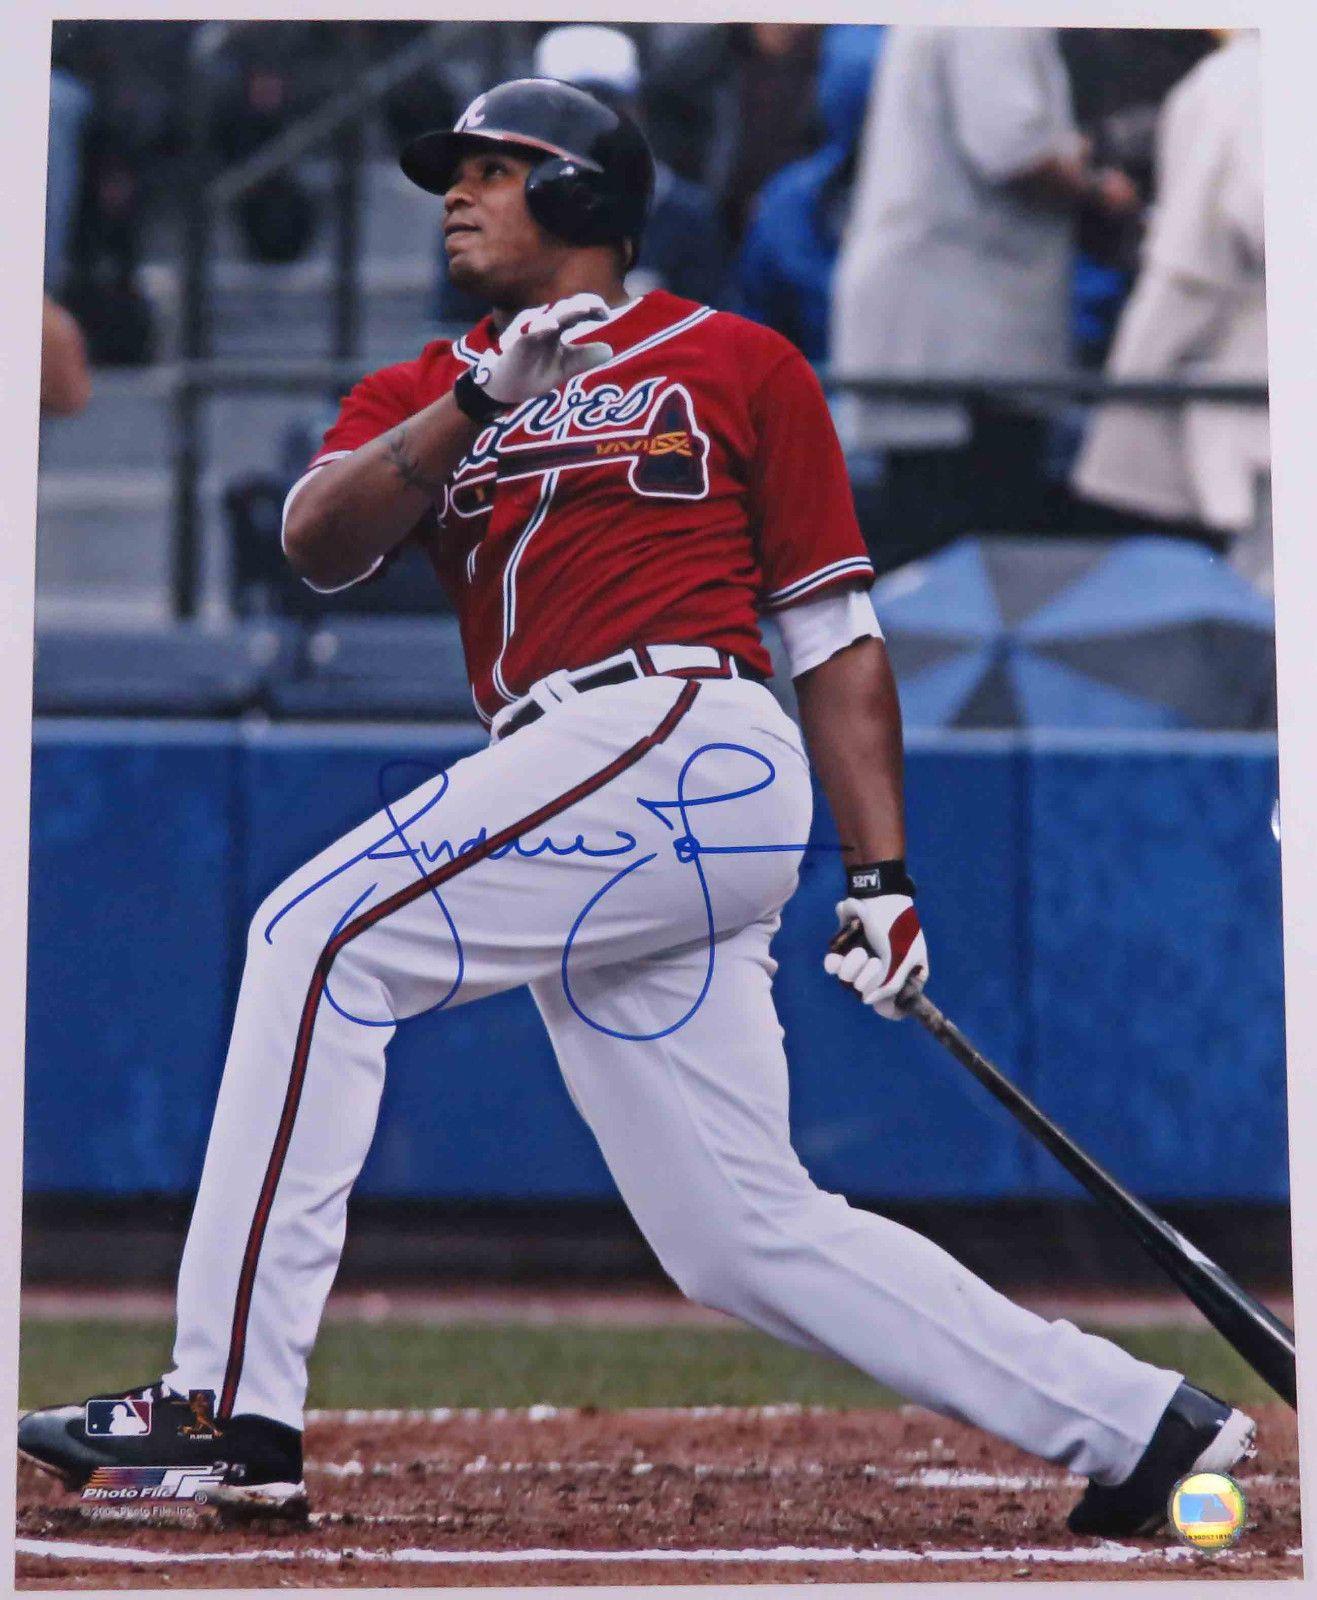 Andruw Jones Autographed Signed 16 X 20 Color Photo Atlanta Braves Yankees Mlb Atlanta Braves Braves Yankees